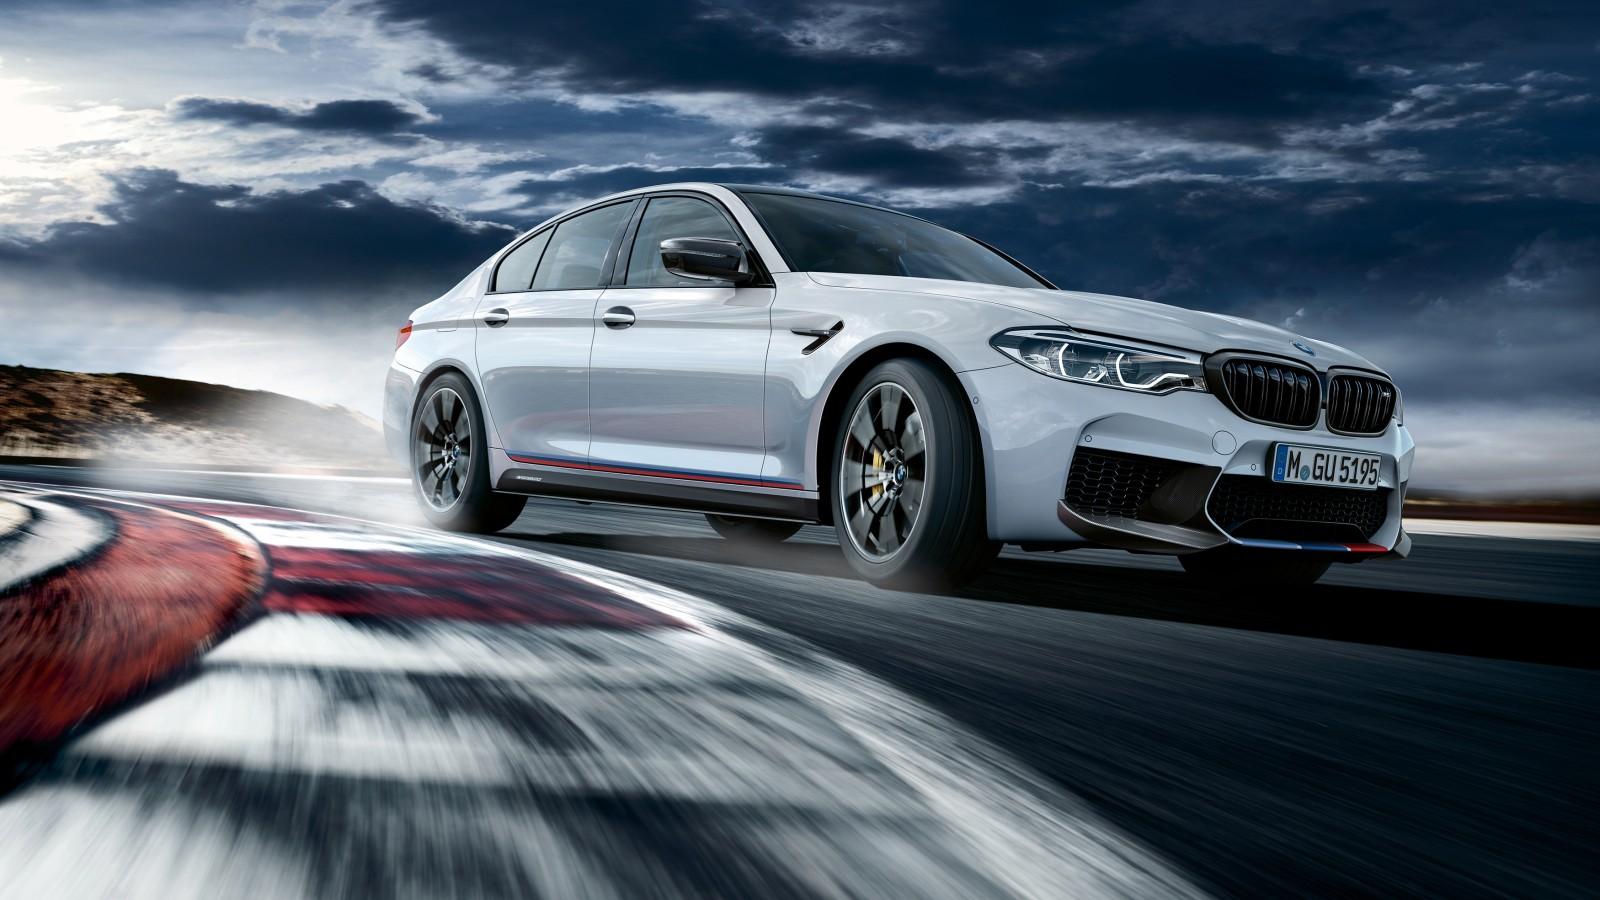 2018 BMW M5 M Performance Parts Wallpaper | HD Car ...